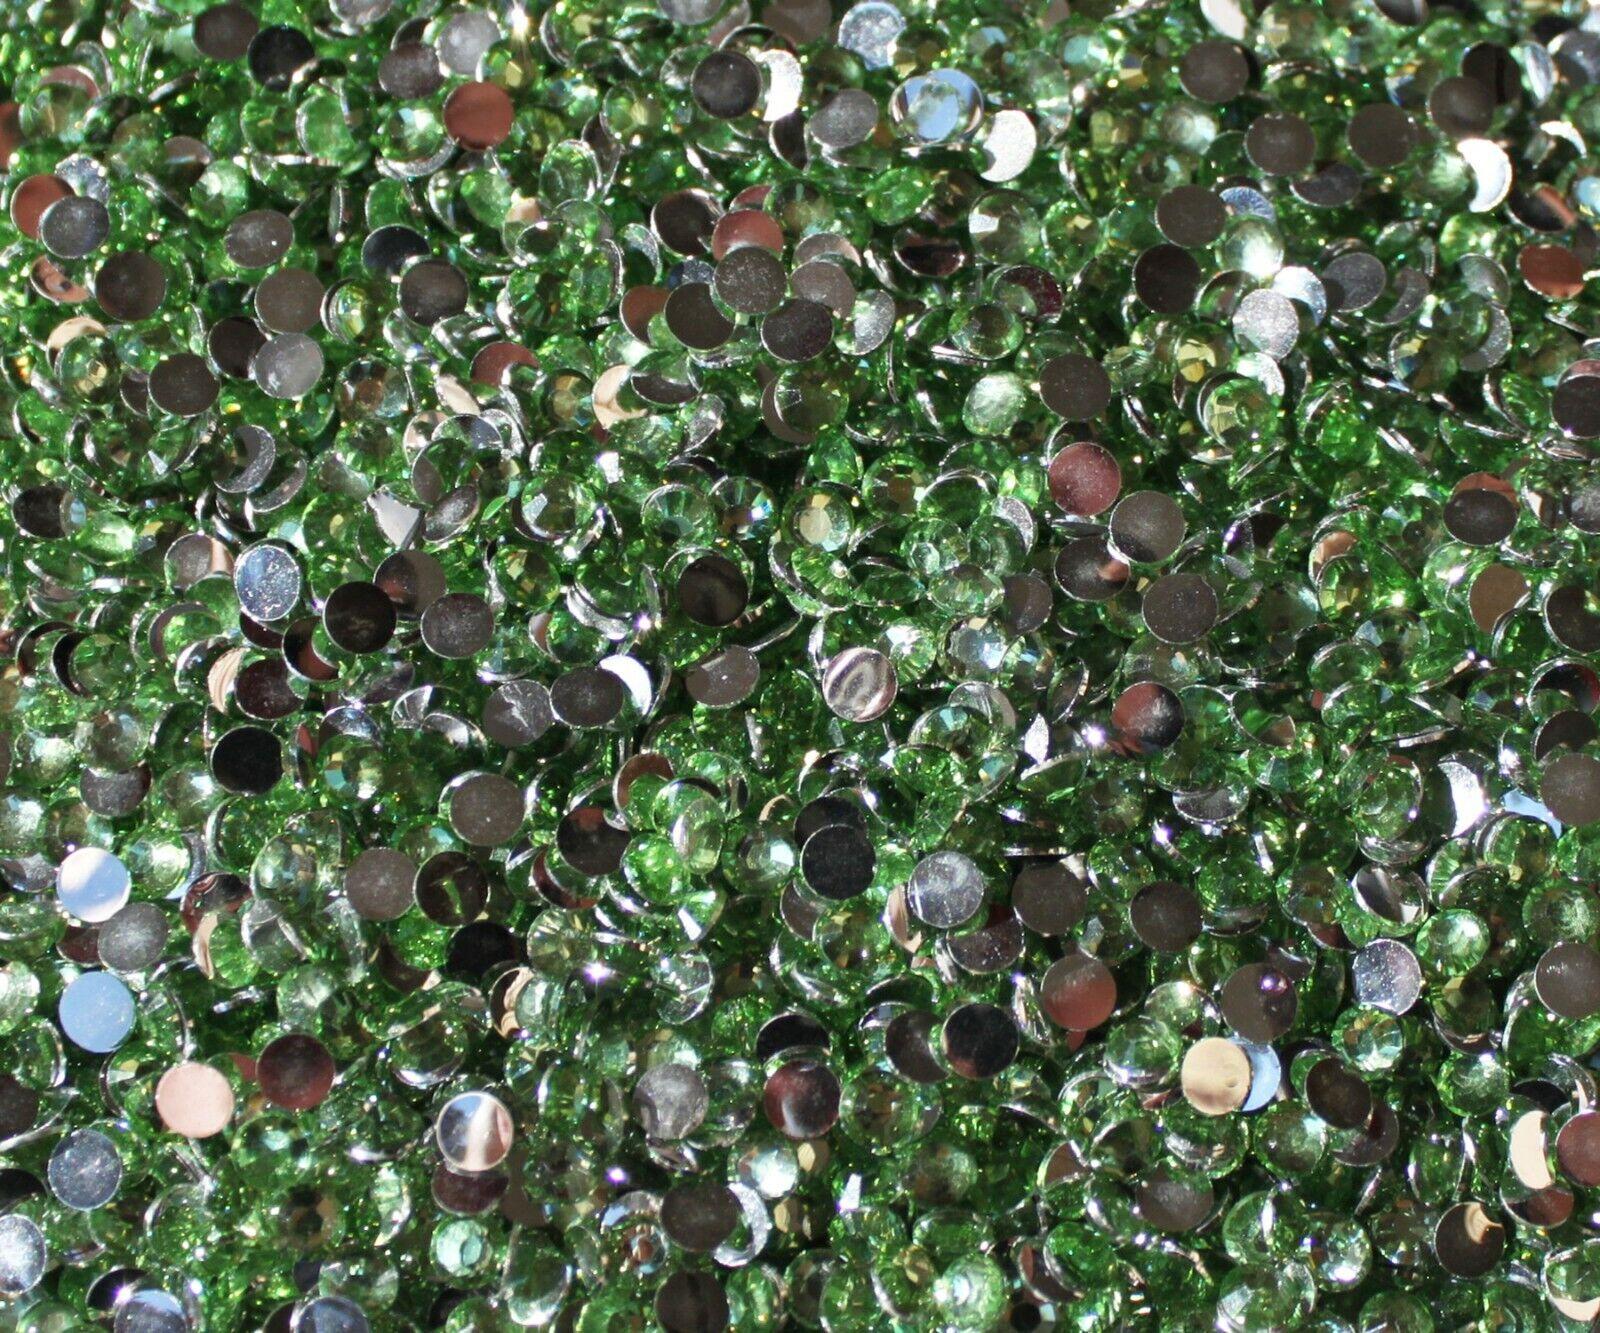 1000 Crystal Flat Back Resin Rhinestones Gems 60 colors, 2mm, 3mm, 4mm, 5mm, 6.5 PALE GREEN